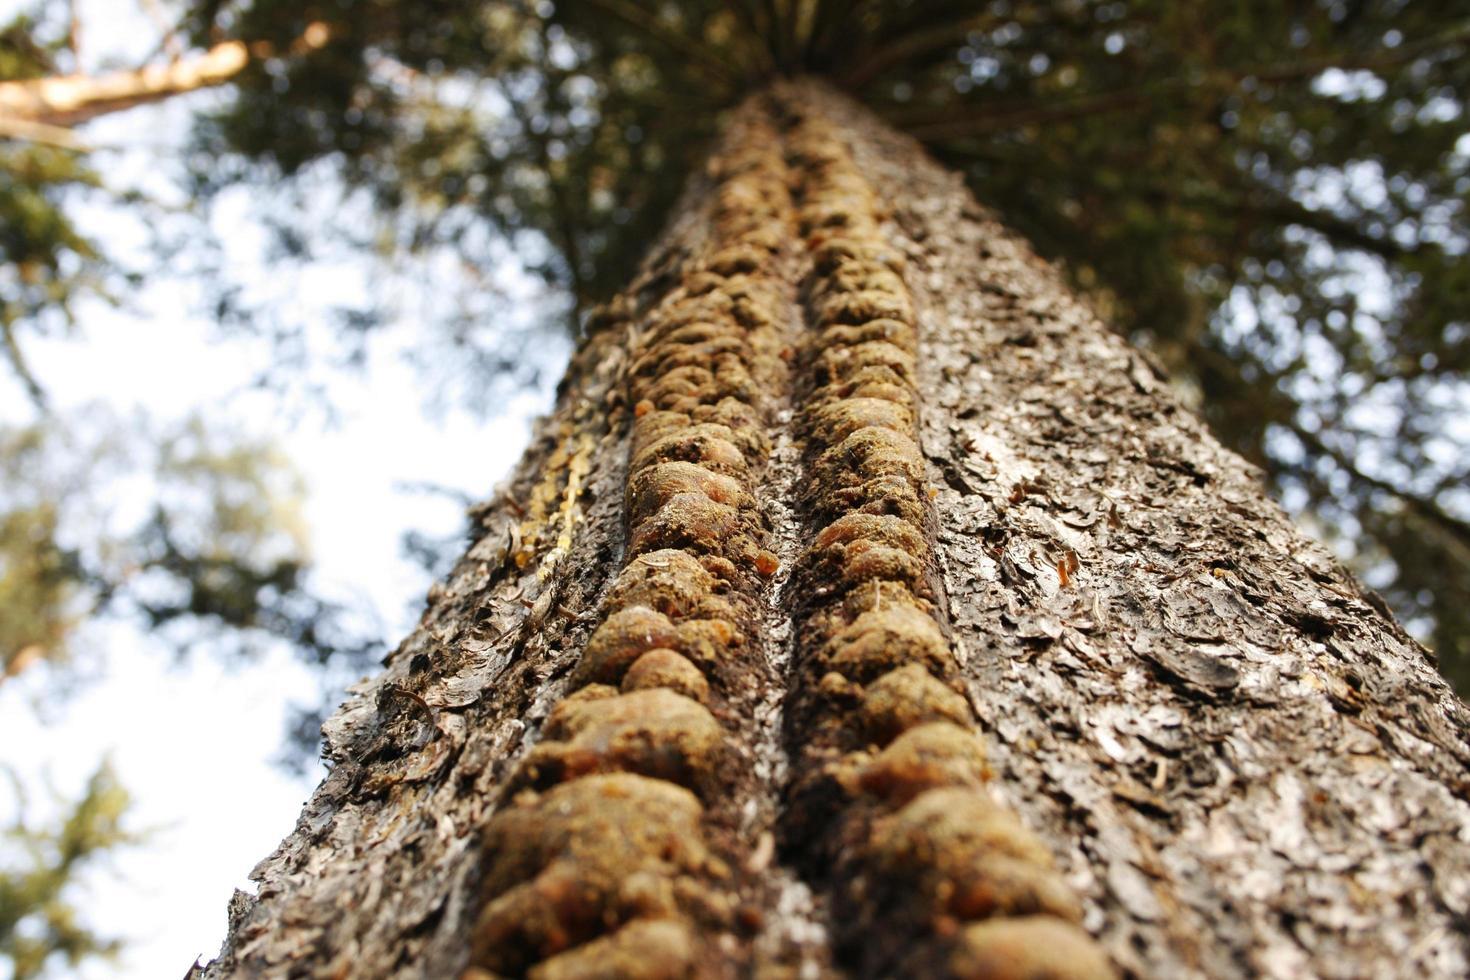 Looking up at a tree photo